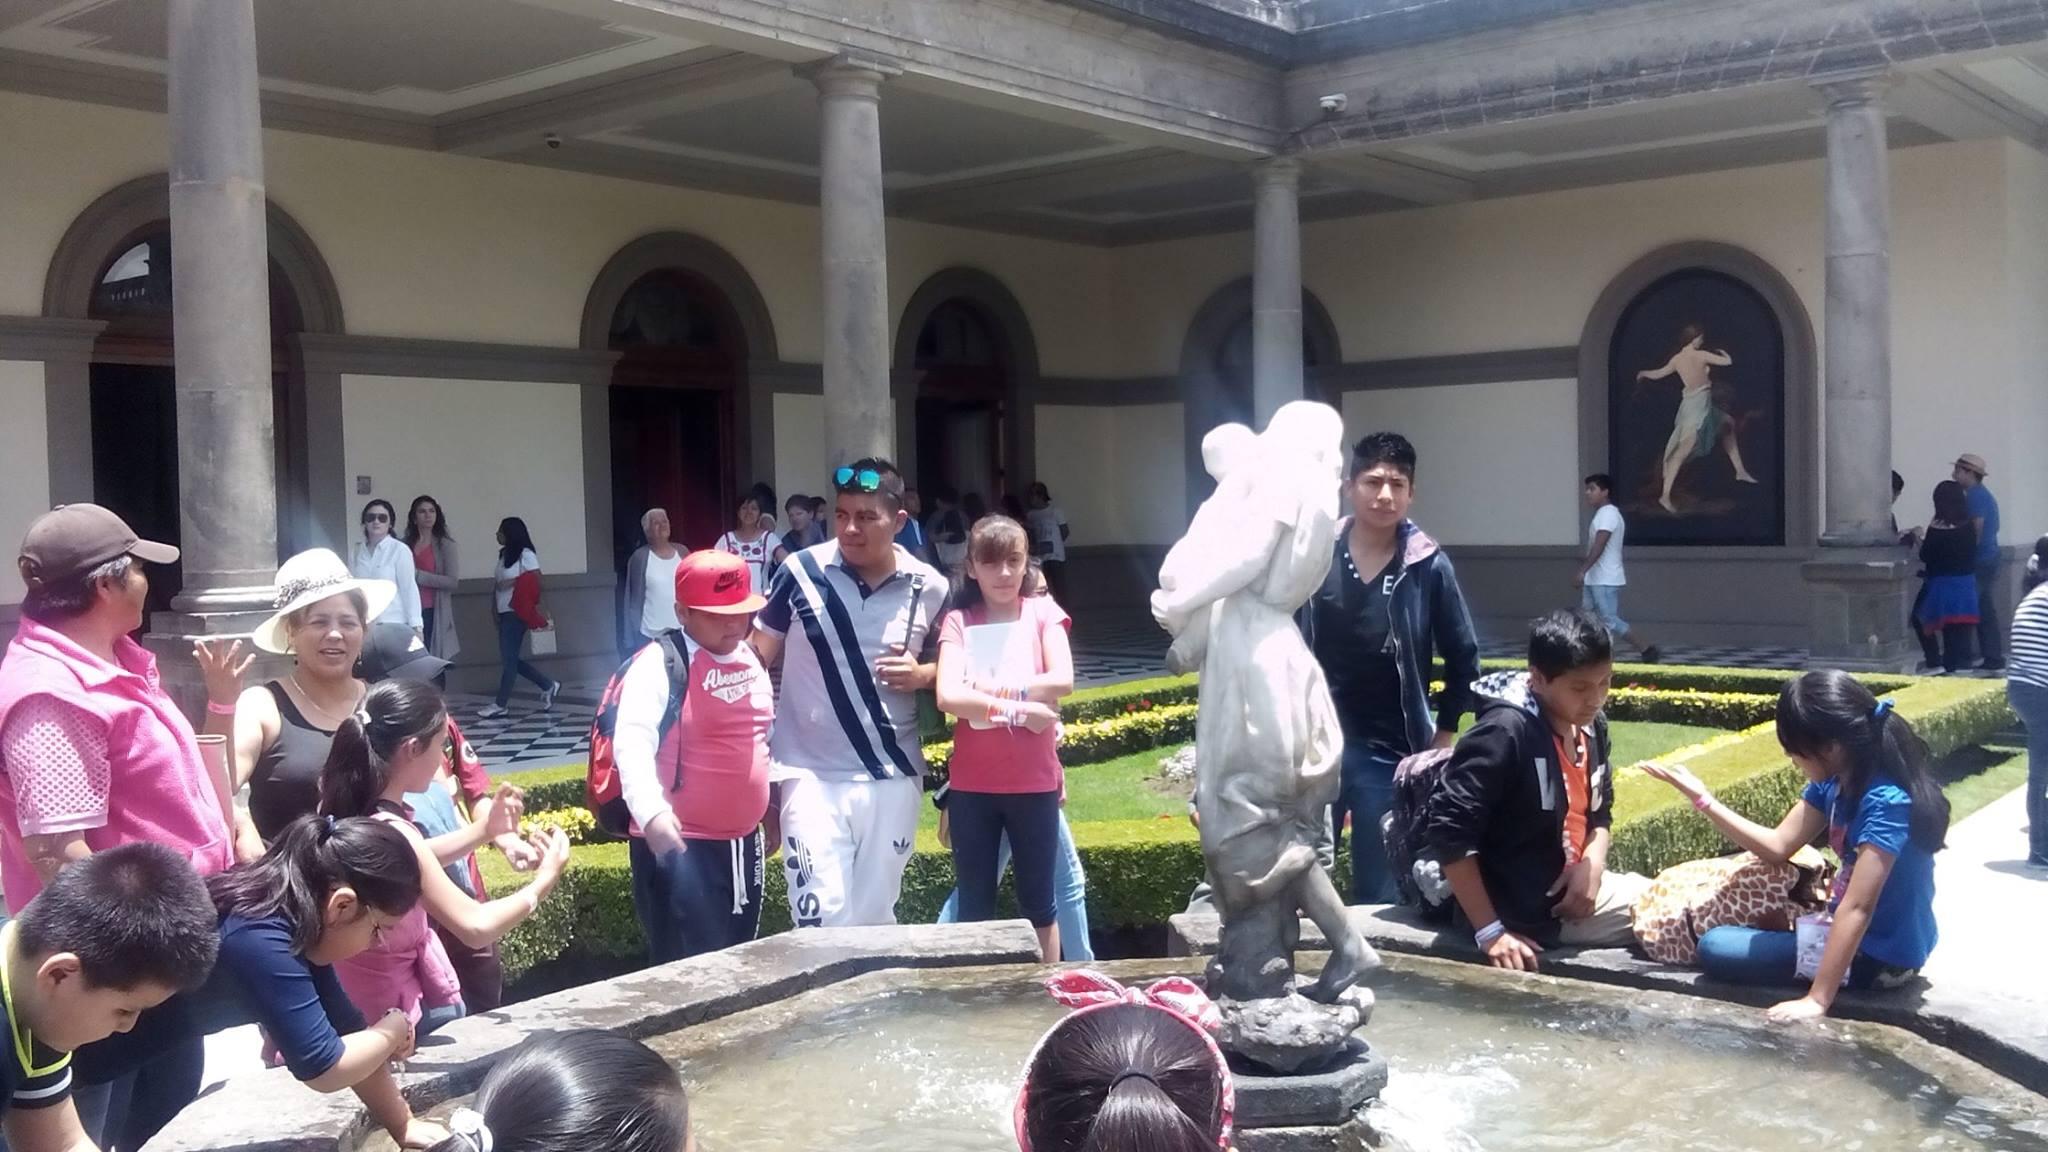 Visita al Castillo de Chapultepec 8